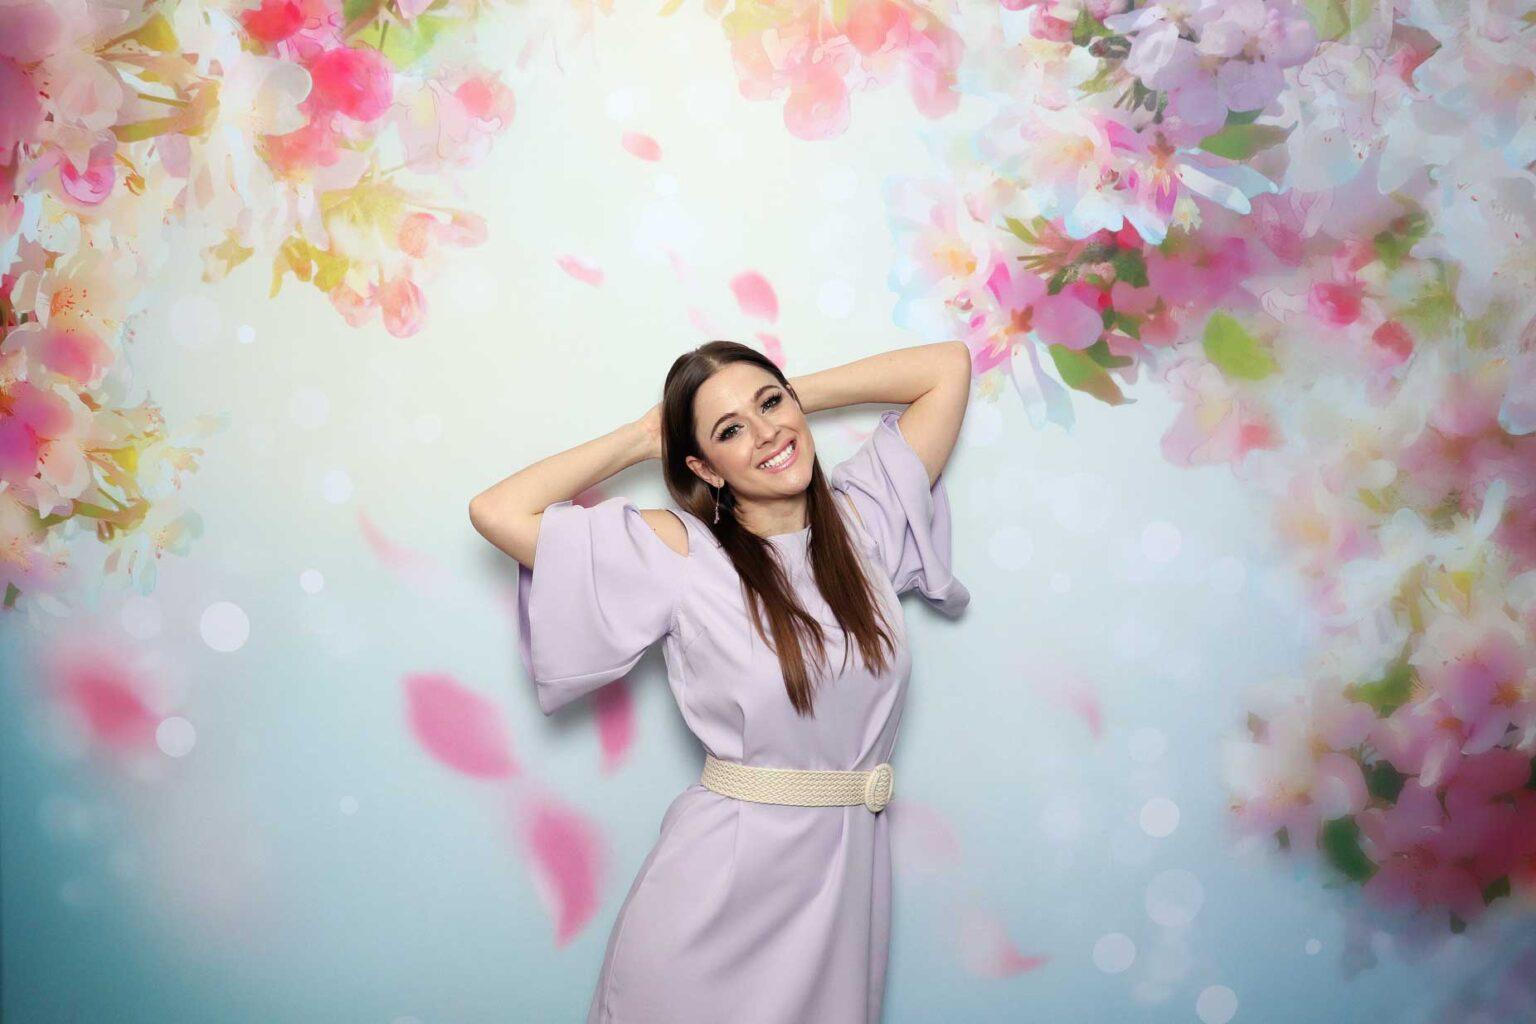 fotostena prenajom cherry blossom fotokutik fotopozadie svadba FOTOKÚTIK.sk